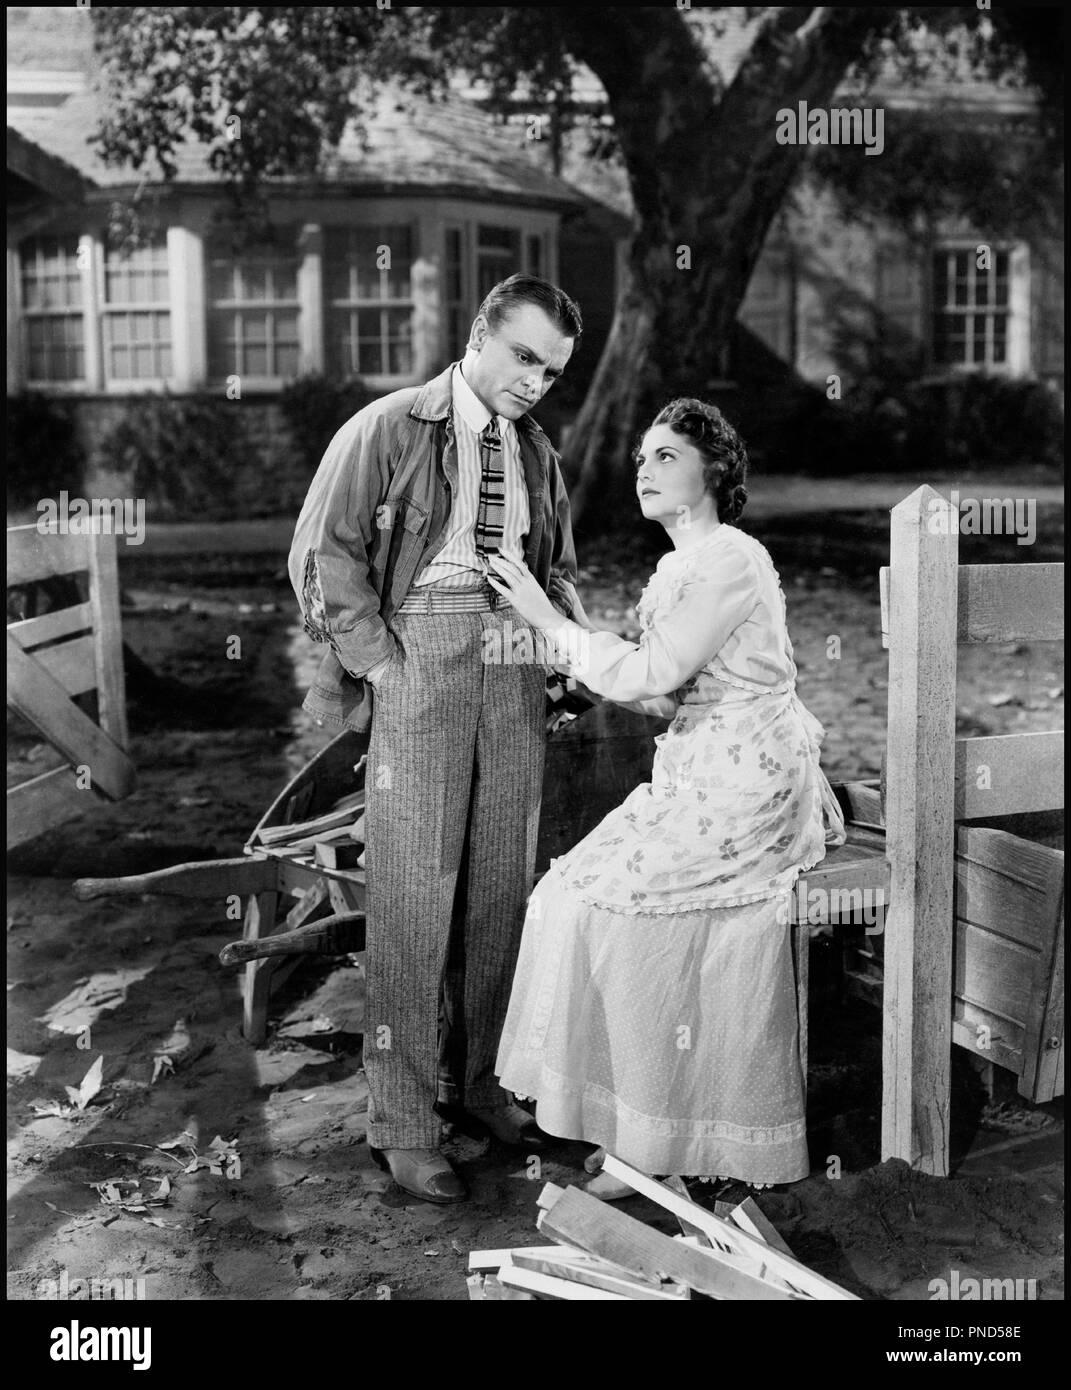 Prod DB © Warner Bros. / DR LA GLORIEUSE PARADE (YANKEE DOODLE DANDY) de Michael Curtiz 1942 USA avec James Cagney et Joan Leslie ruines, desolation, reconforter - Stock Image